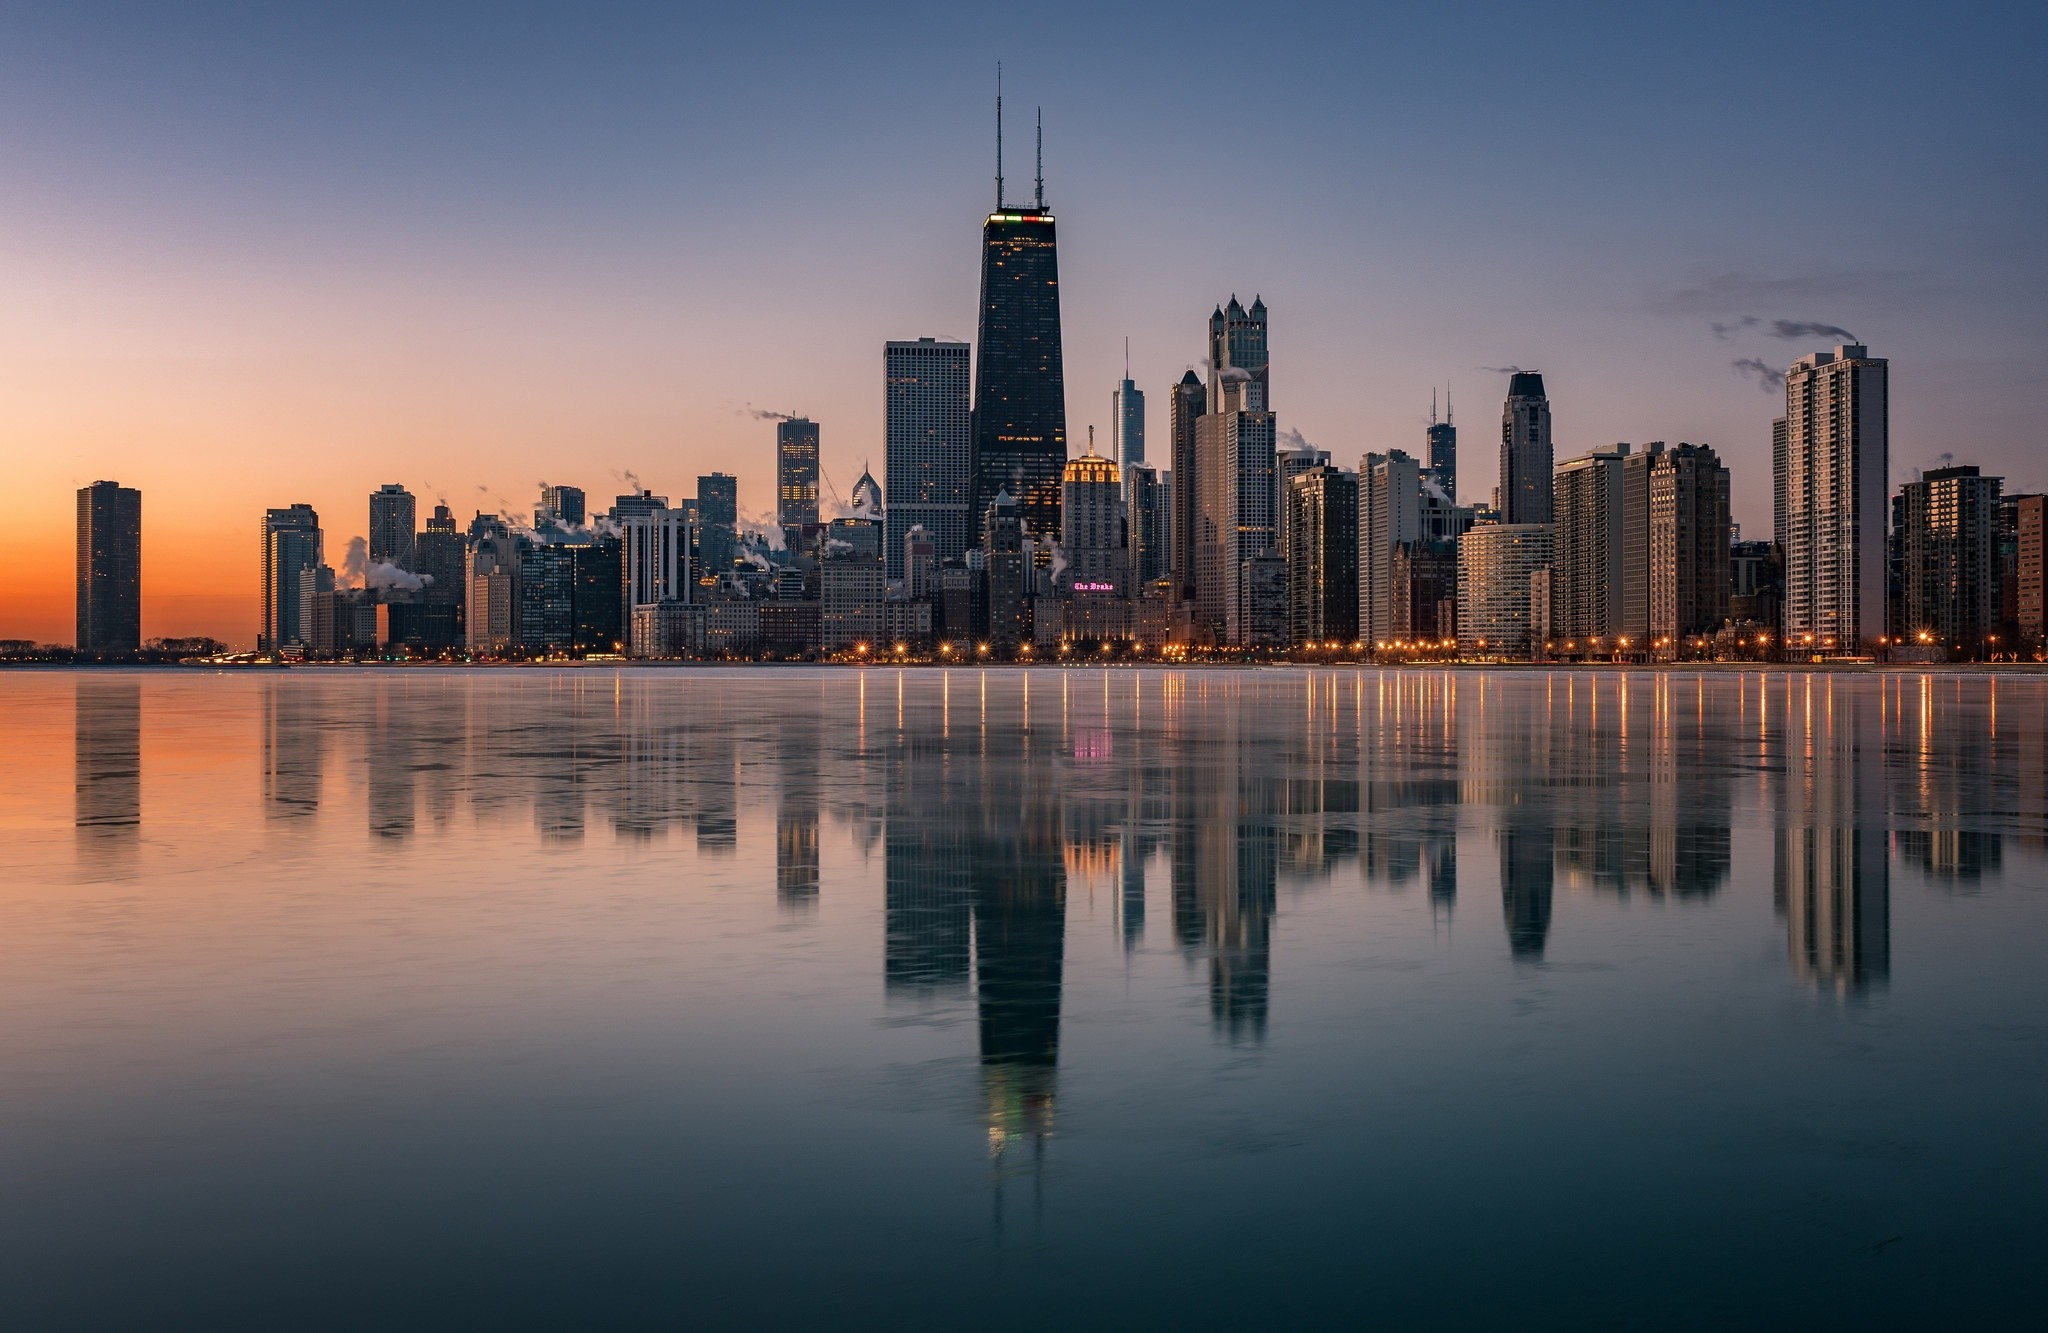 Man Made – Chicago USA City Reflection Building Skyscraper Wallpaper